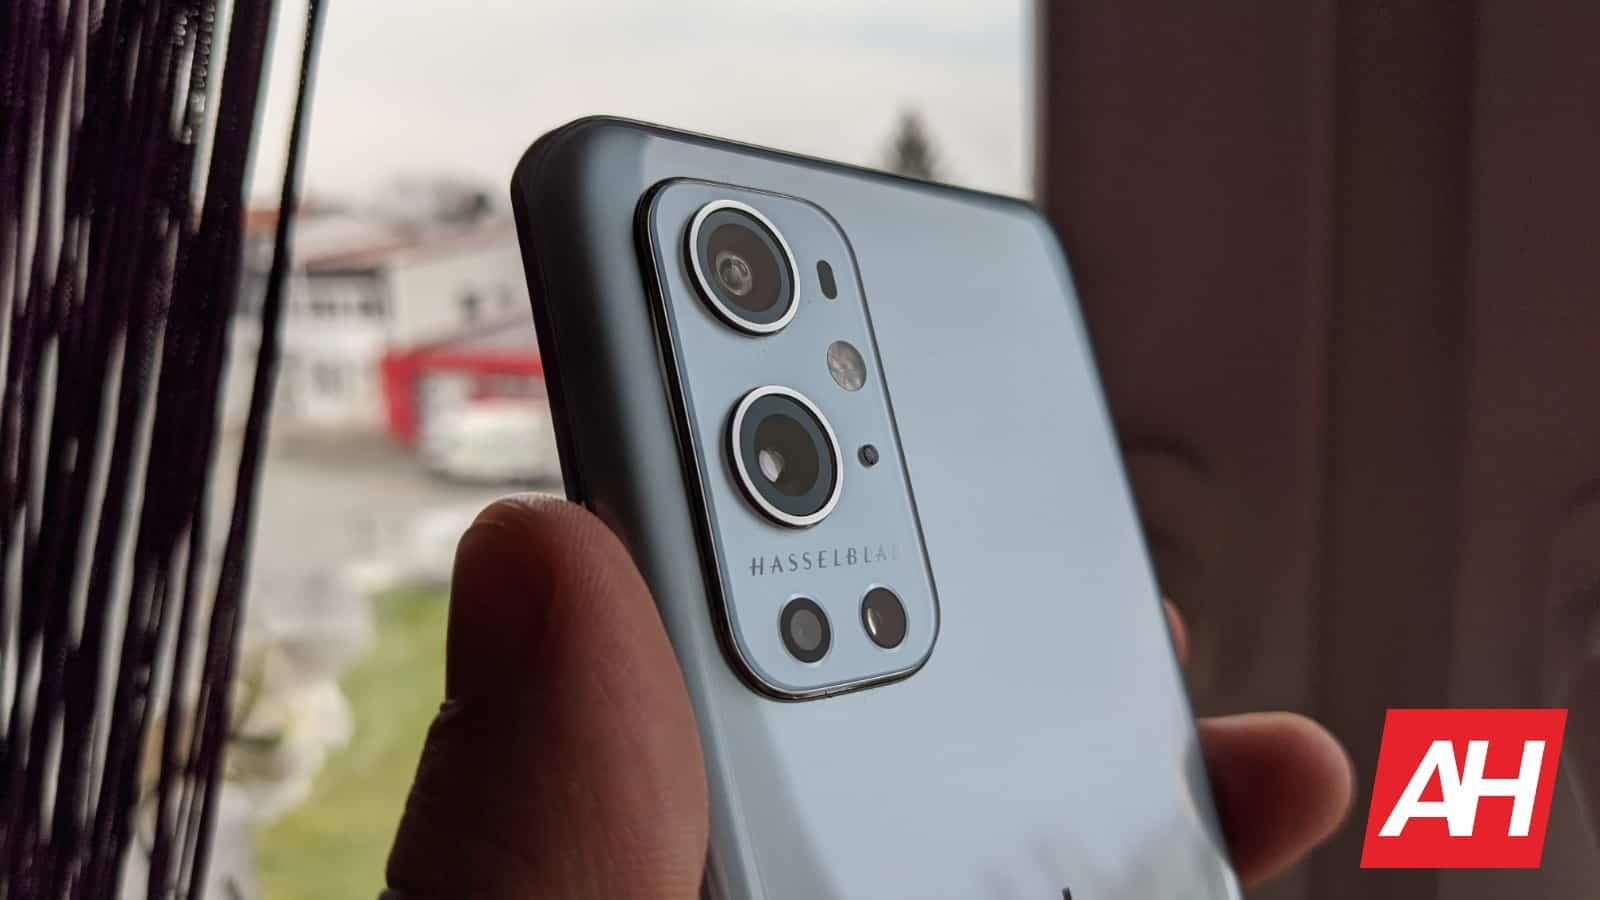 AH OnePlus 9 Pro KL image 32